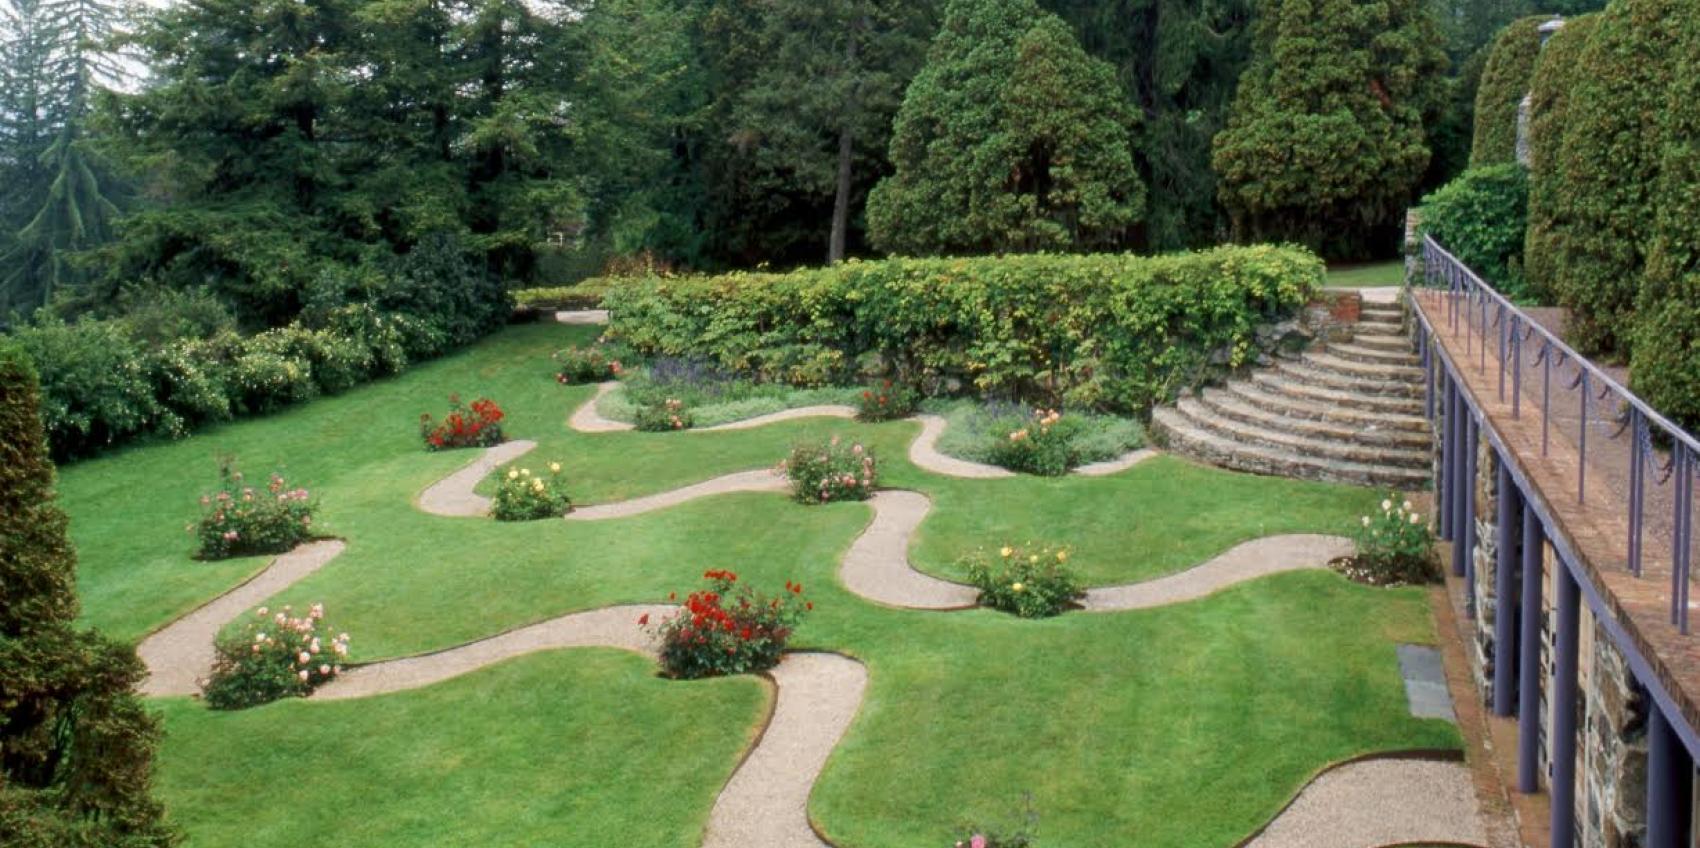 The Trustees American Public Gardens Association